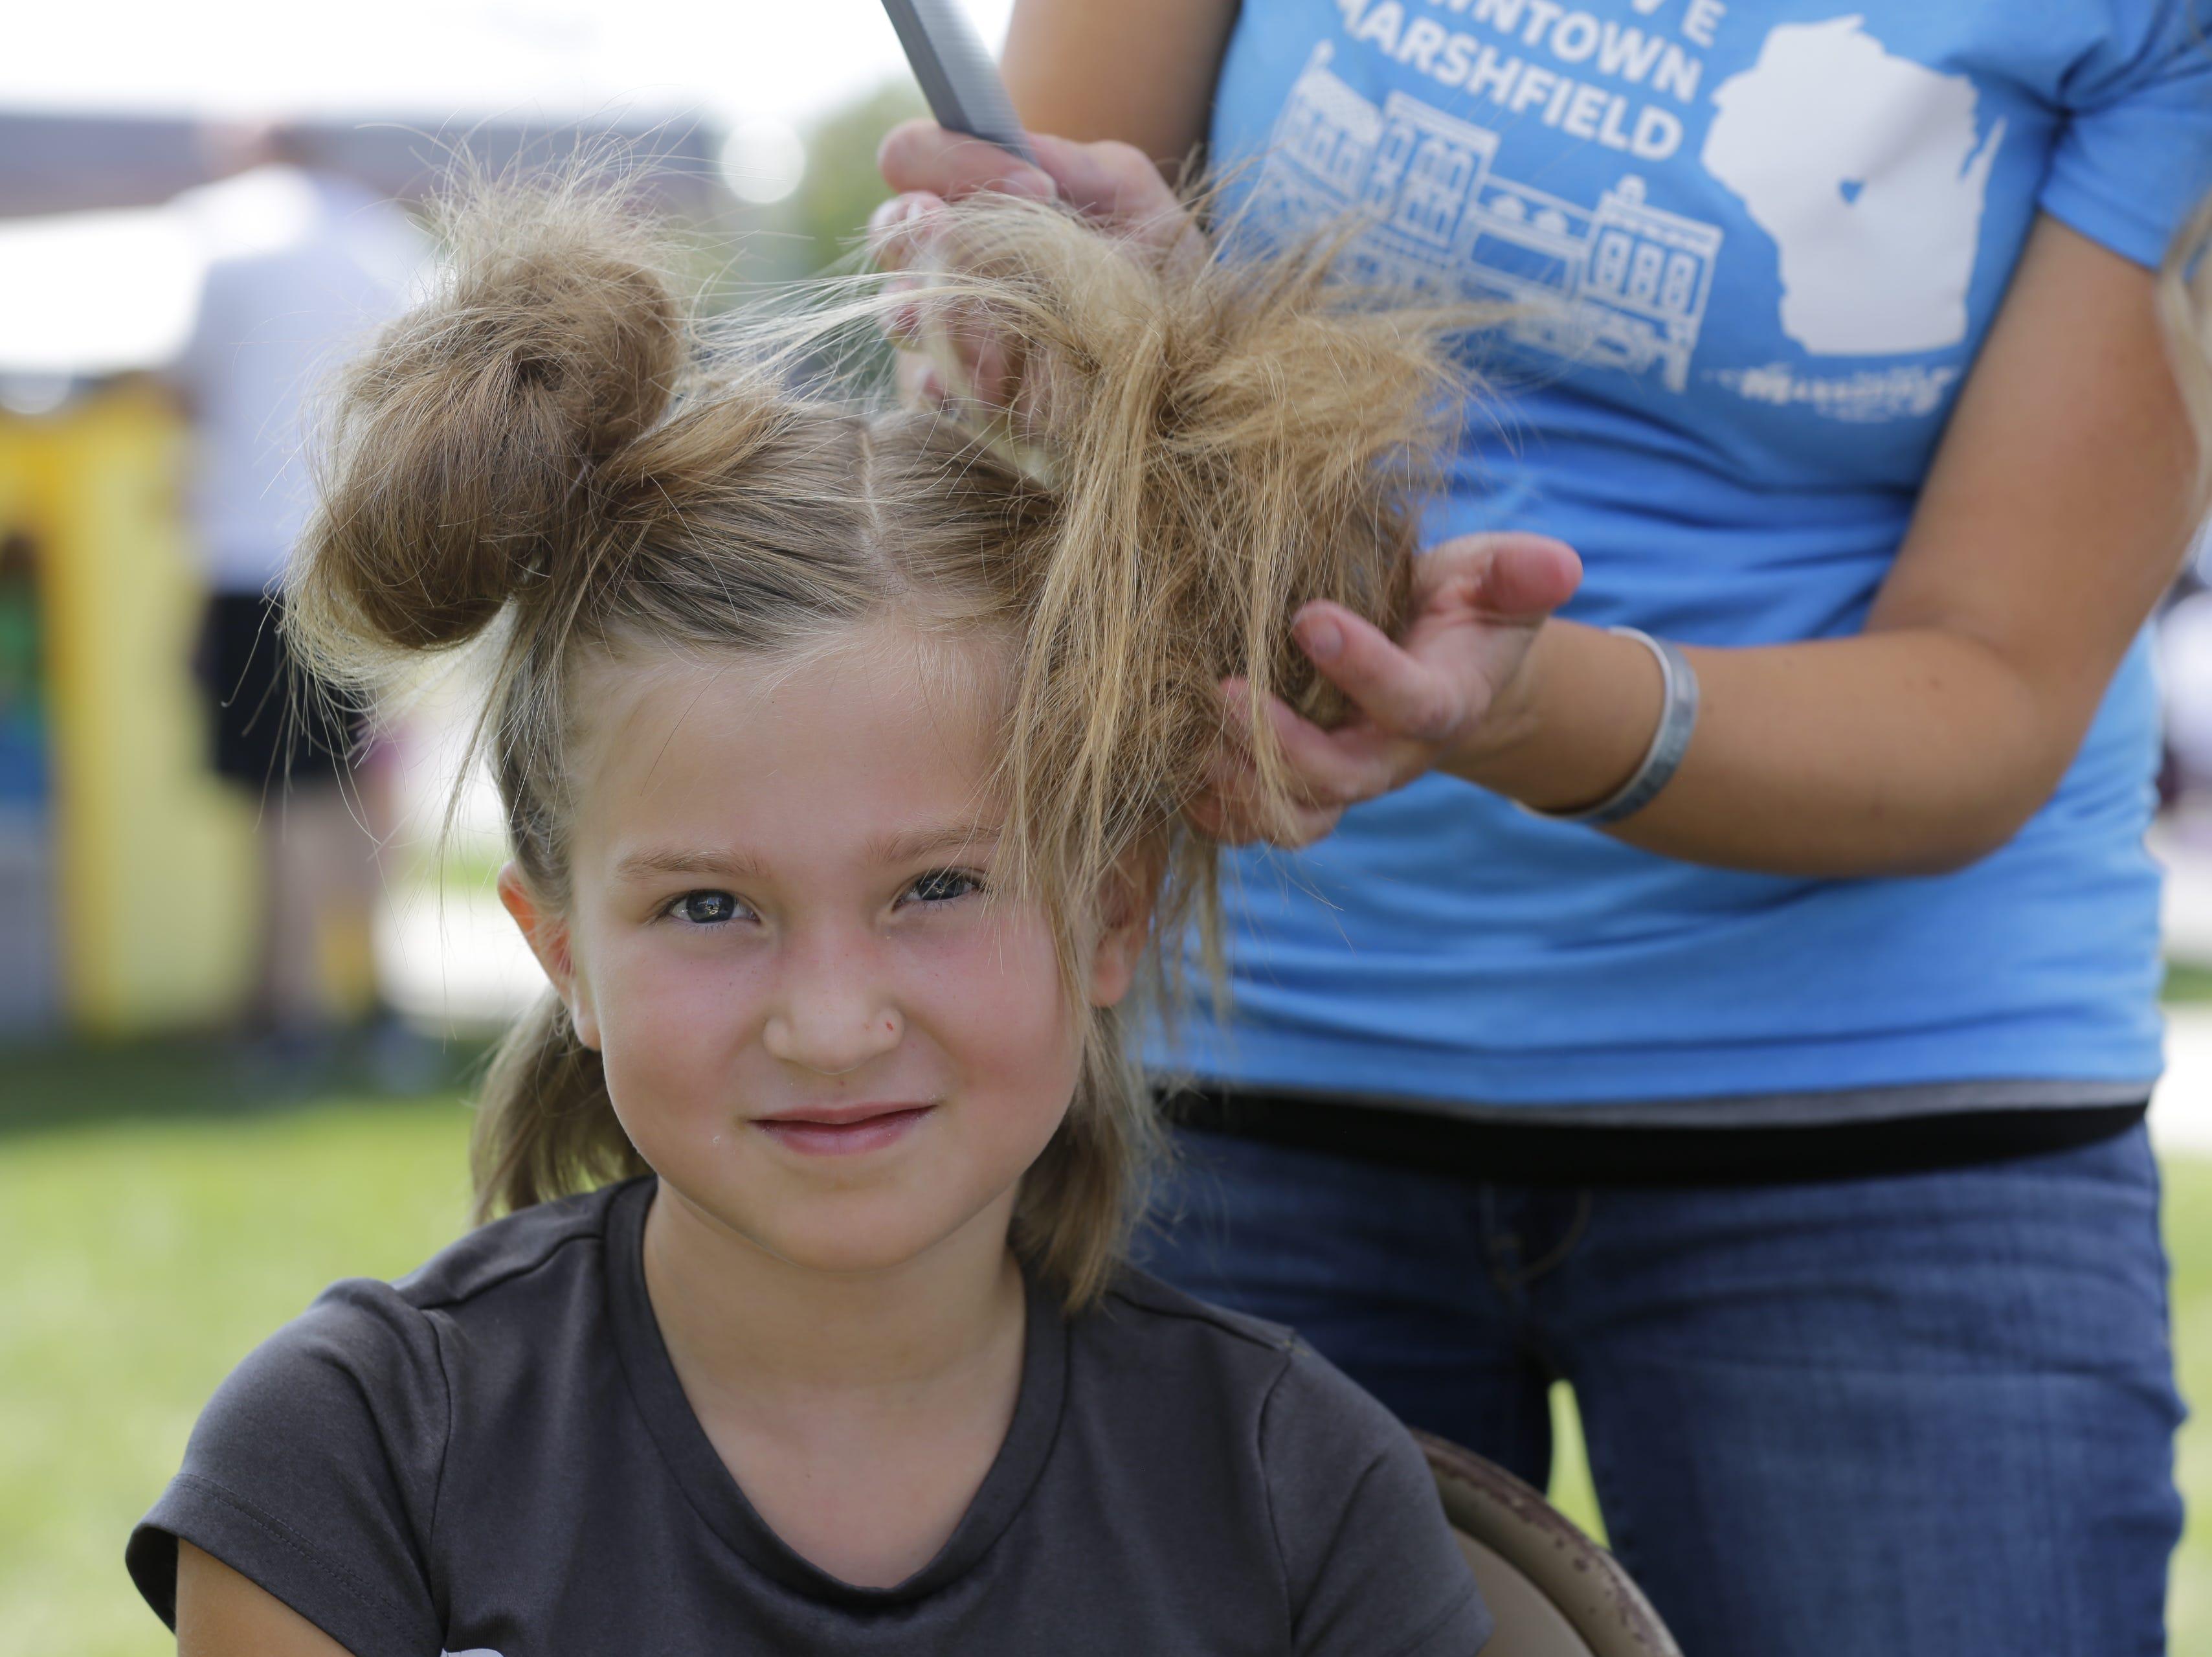 Elly Gardner, 7, of Marshfield gets crazy hair at Hub City Days in downtown Marshfield Saturday, July 28, 2018.